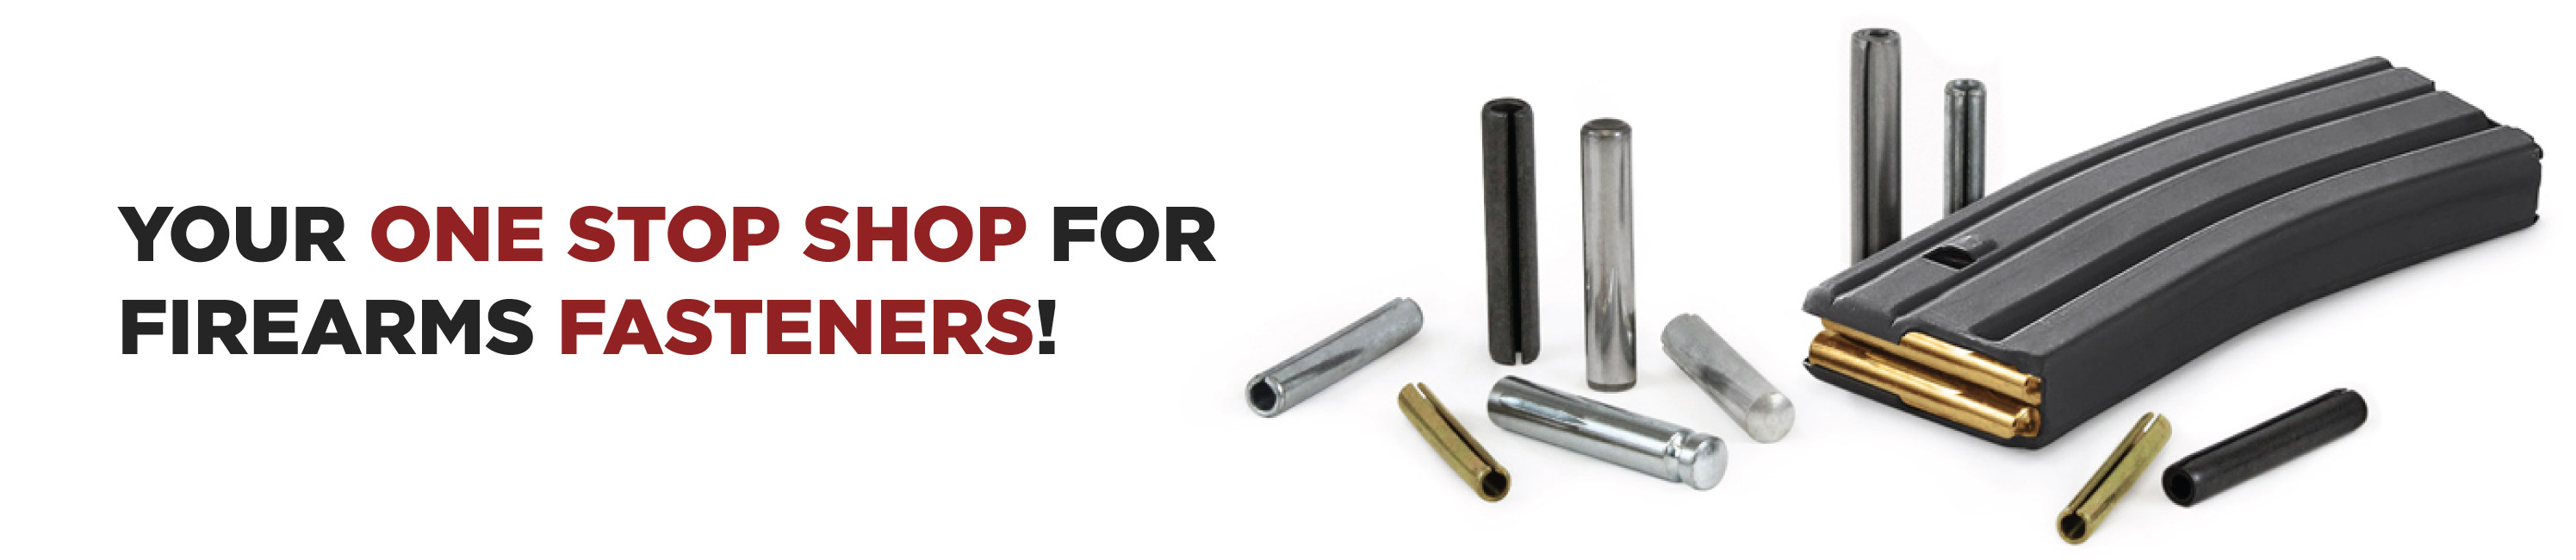 Firearm Manufacturers Banner